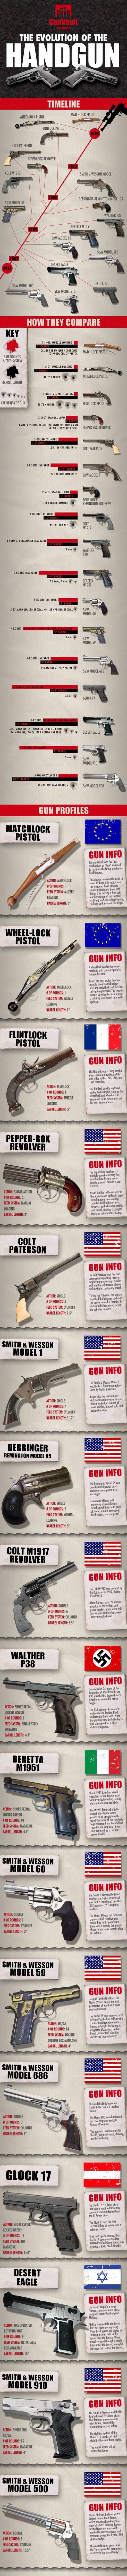 The evolution of the handgun #infographic